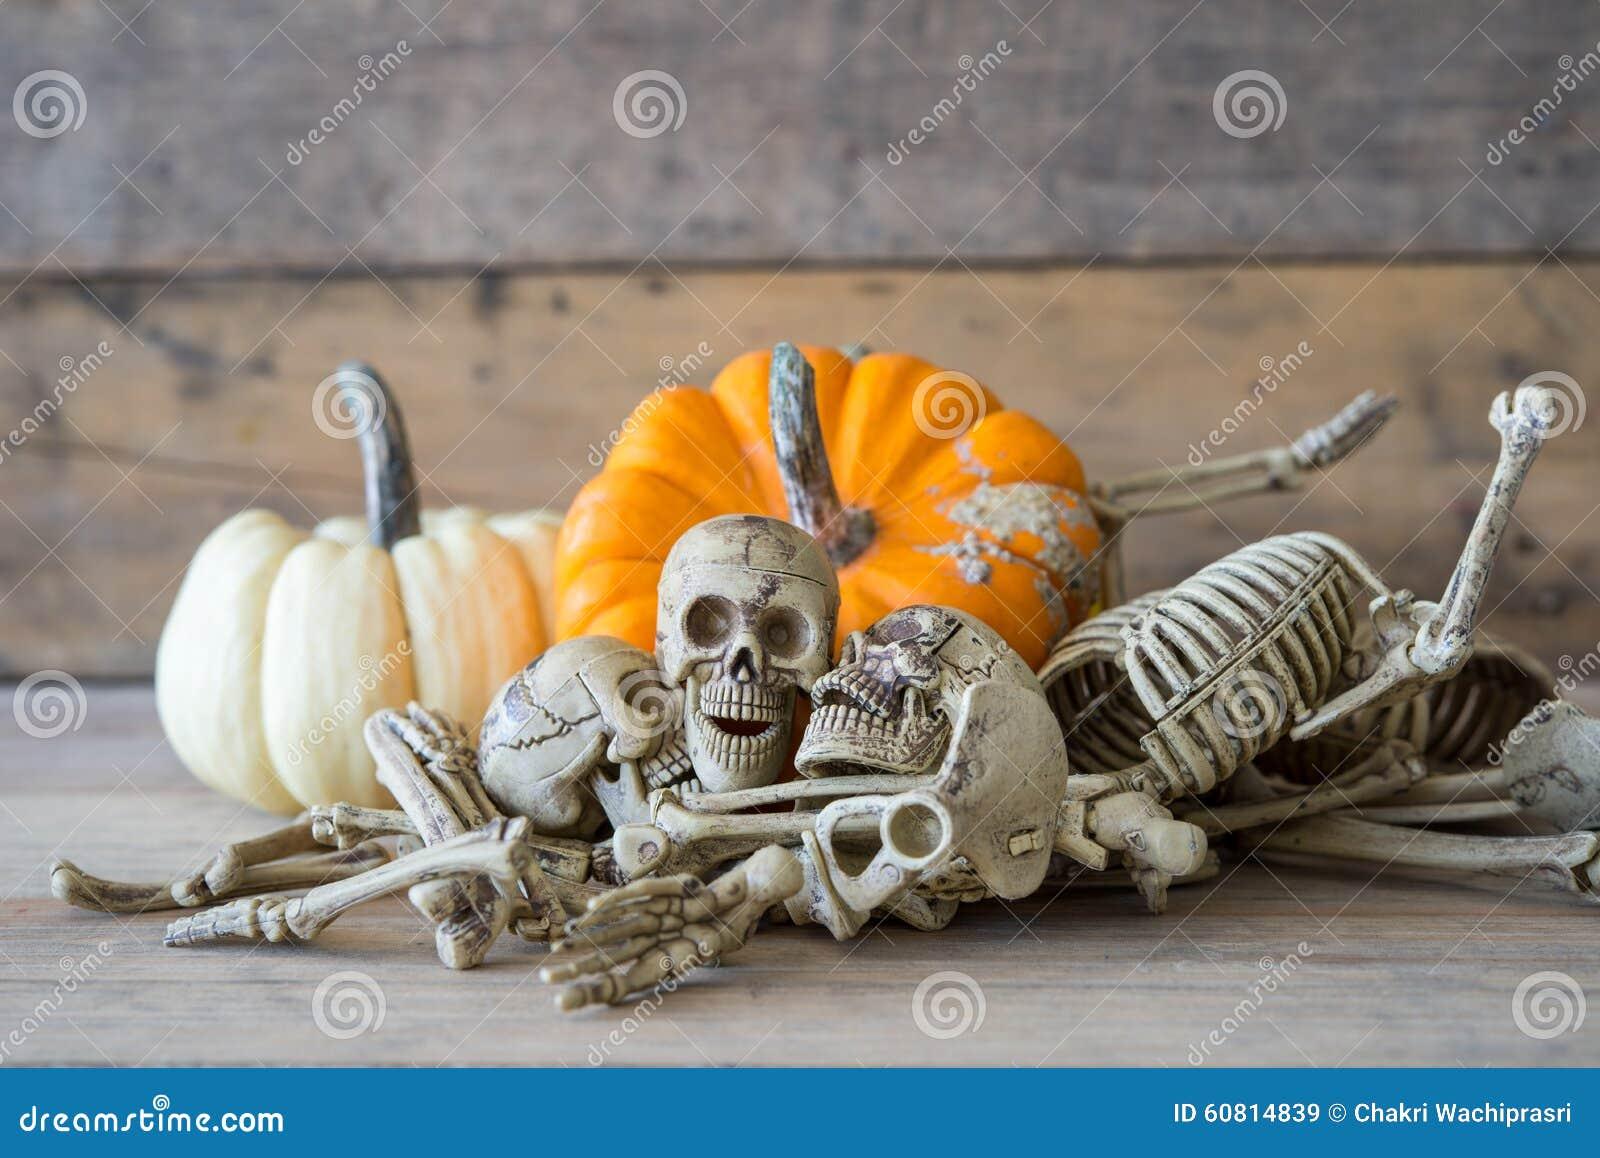 Human skull on wood background ,Skeleton and pumpkin on wood ,Happy Halloween background